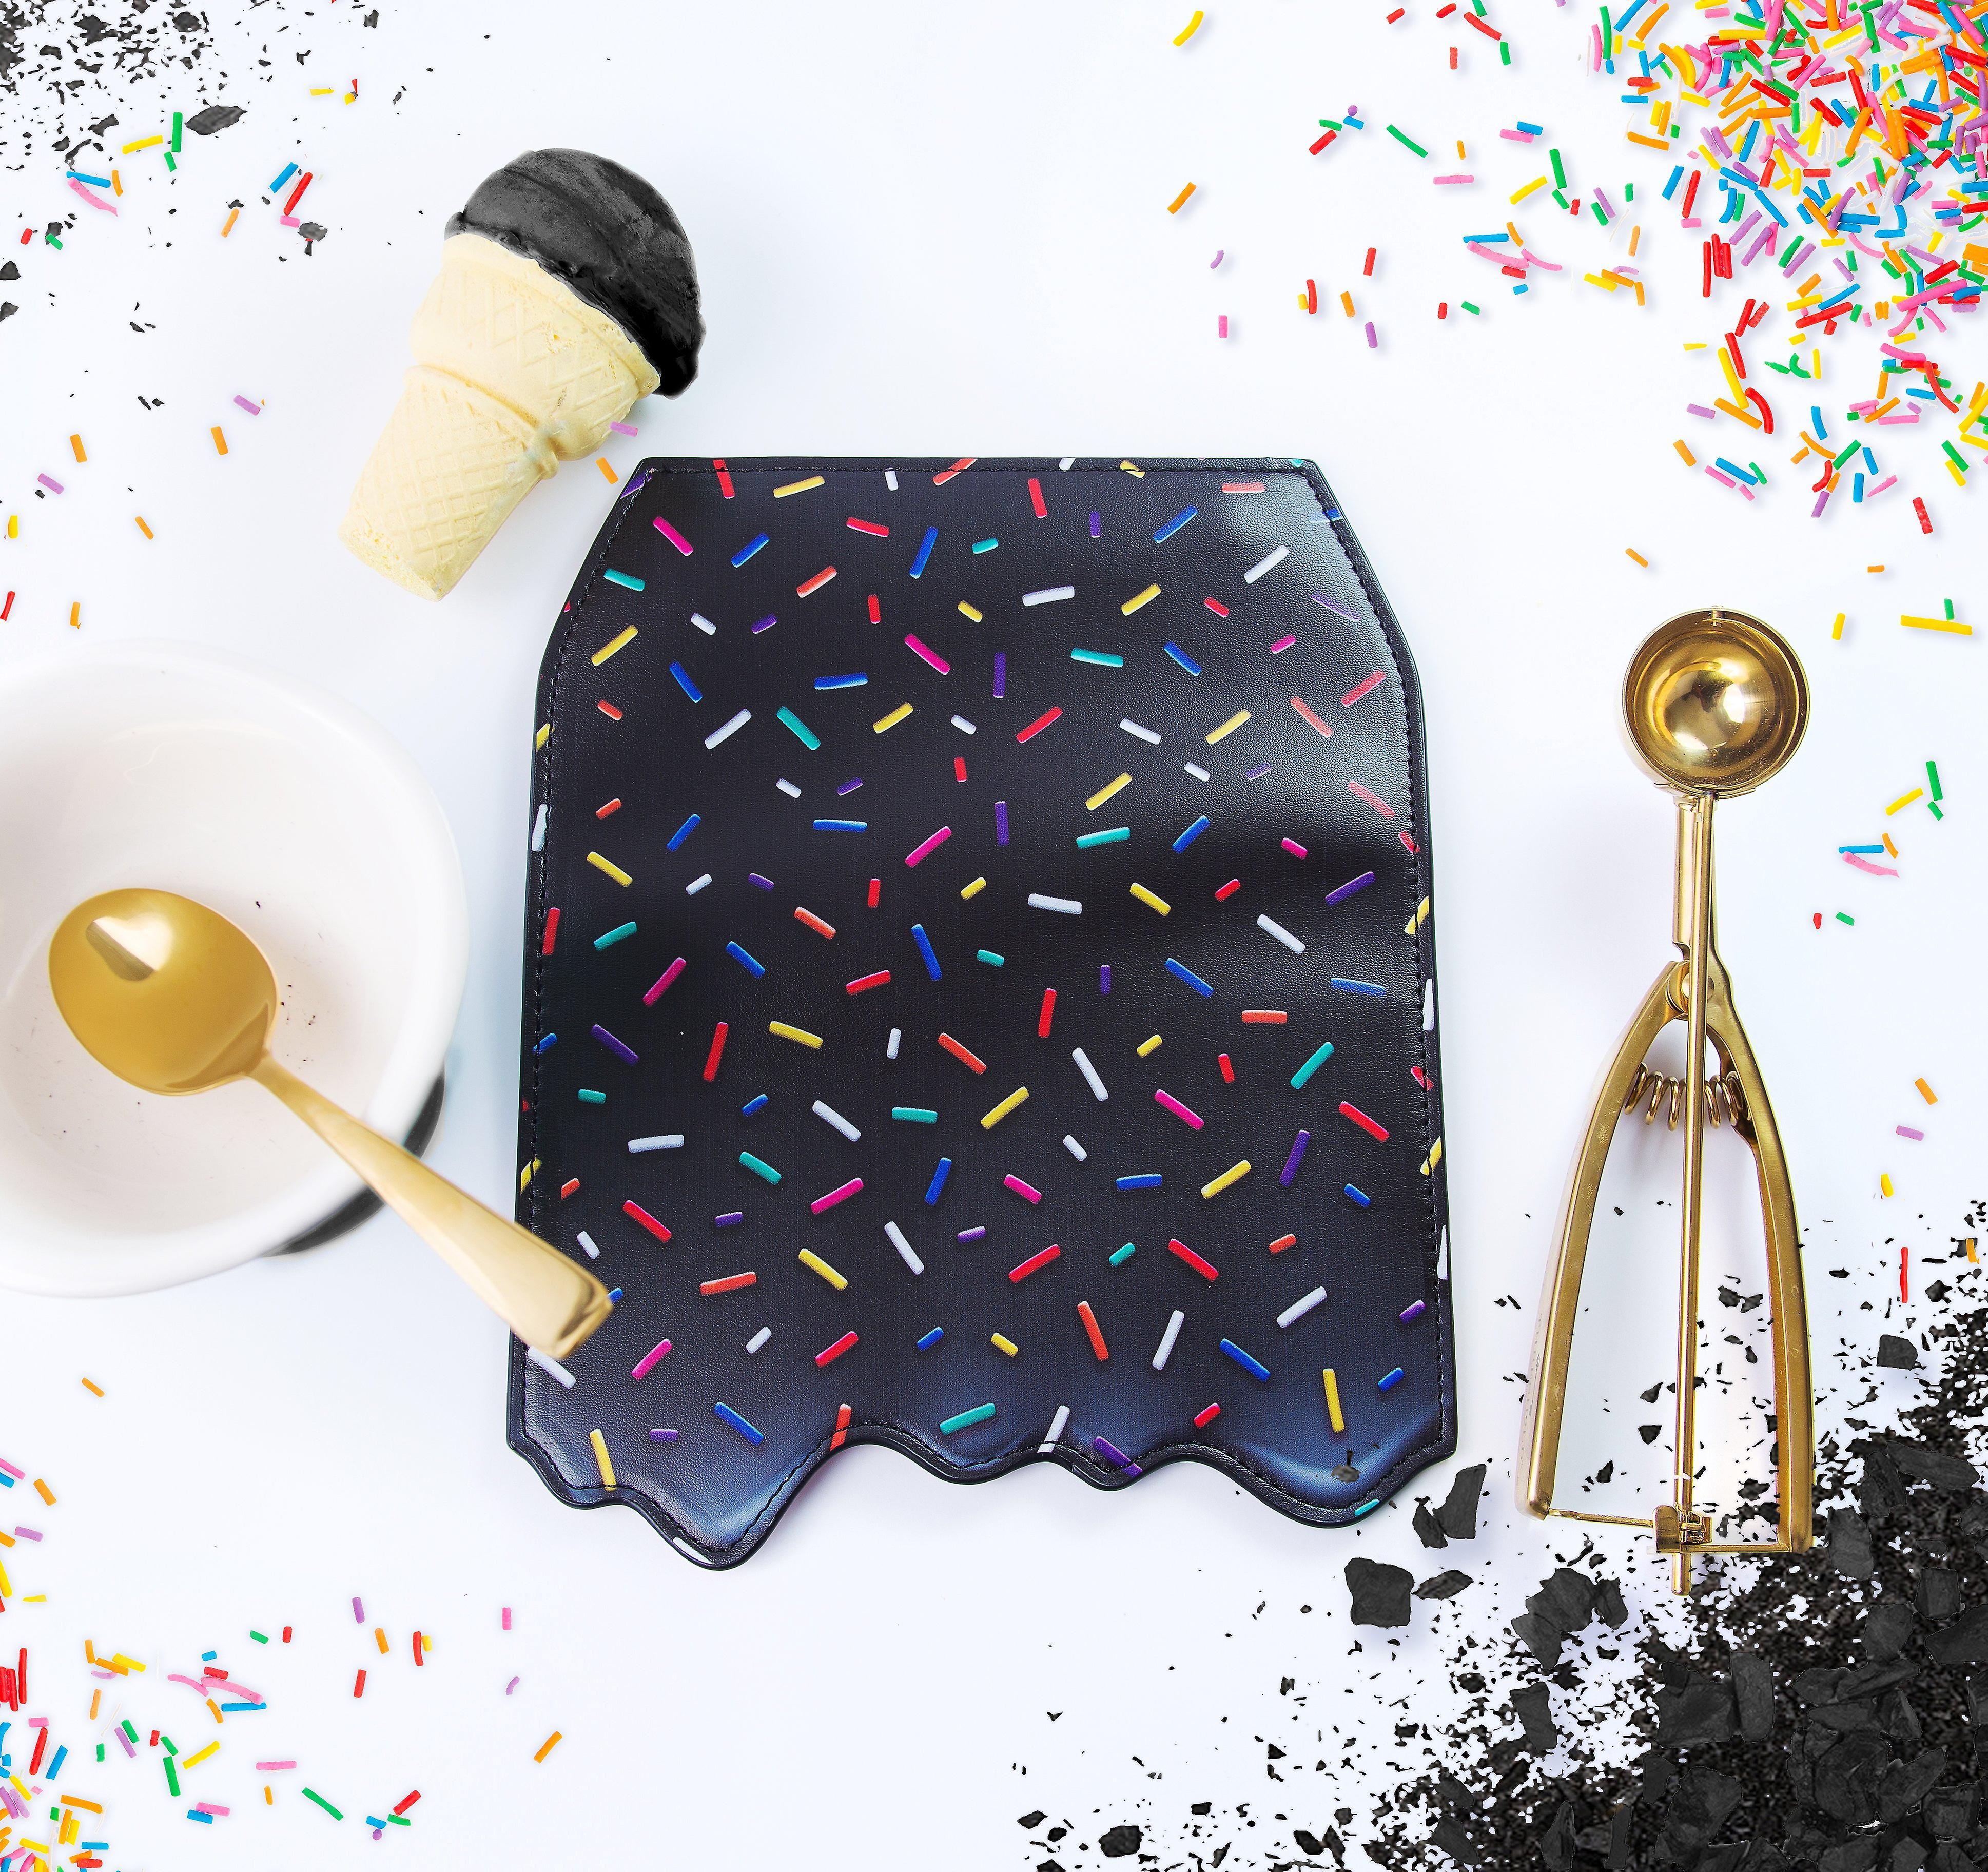 Bake-A-Bag Charcoal Sprinkle Flap